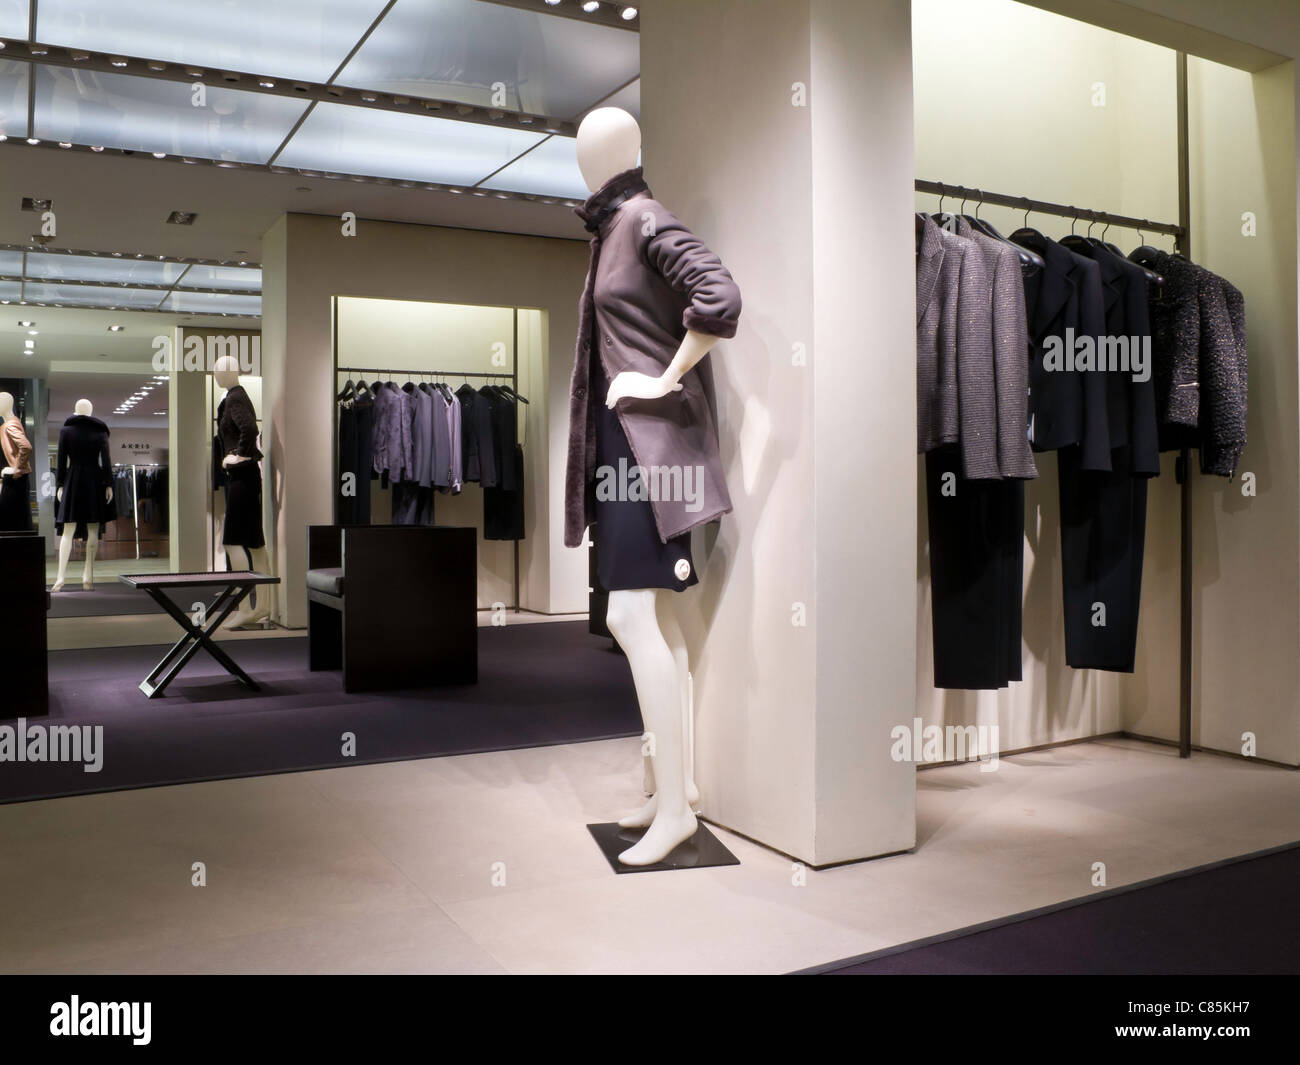 9cfb20d46ea Women's Designer Clothing Display, Bloomingdale's Department Store ...